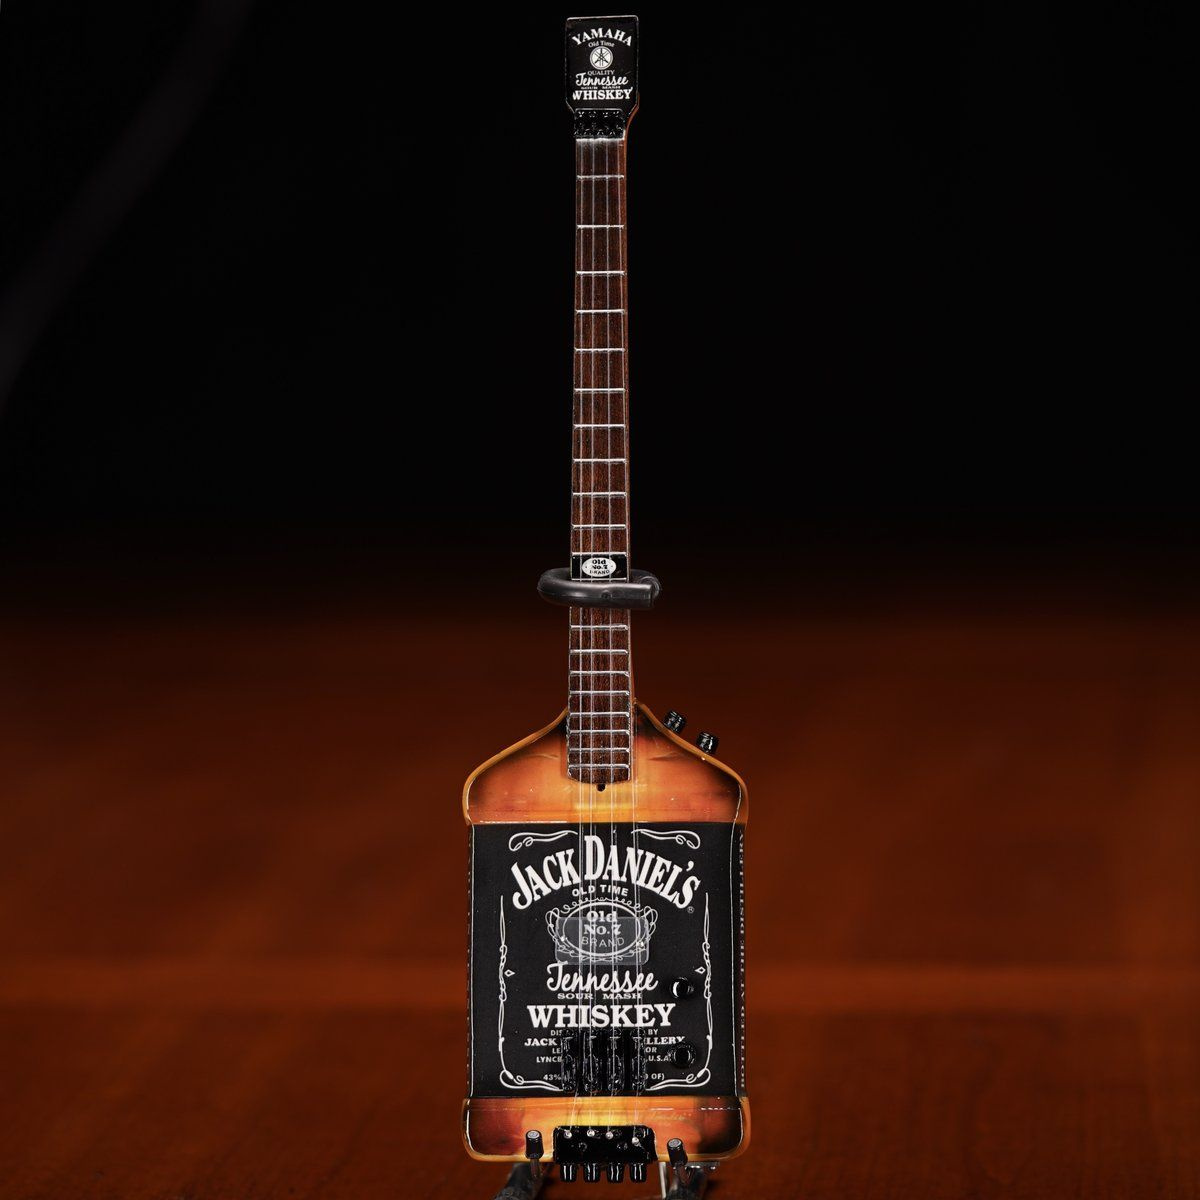 Jack Daniel S Handcrafted Bass Guitar Jack Daniels Bass Guitar Whiskey